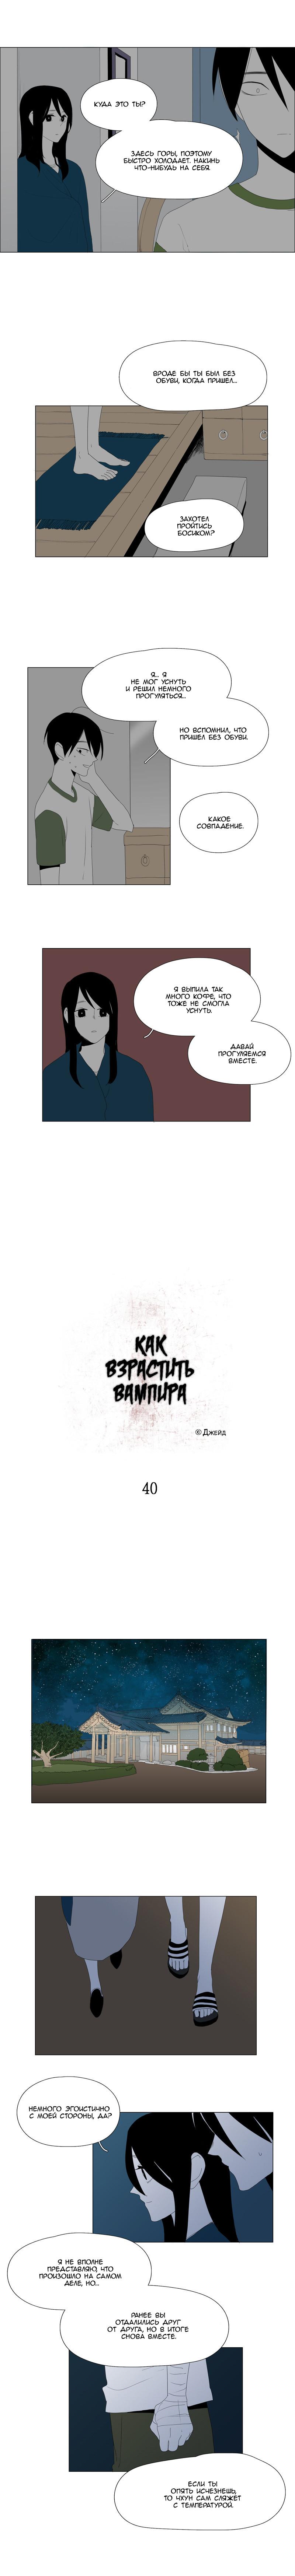 https://r1.ninemanga.com/comics/pic2/33/27873/311923/1477614072312.jpg Page 3